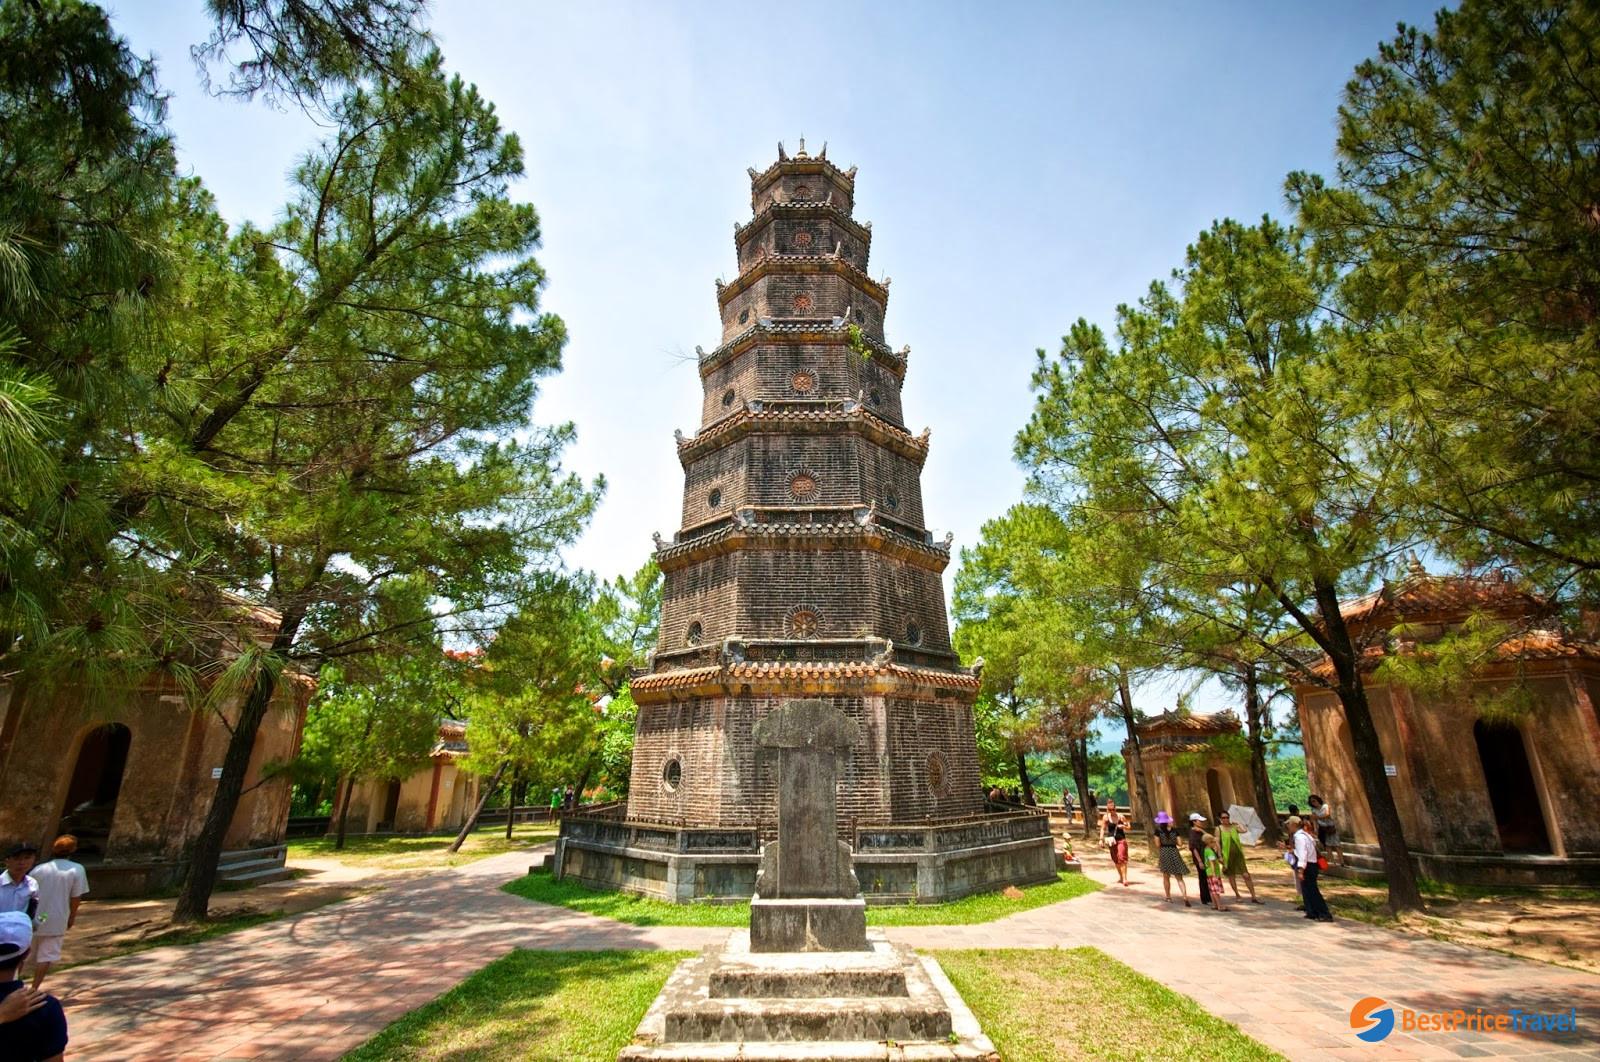 Thien Mu Pagoda has its legend